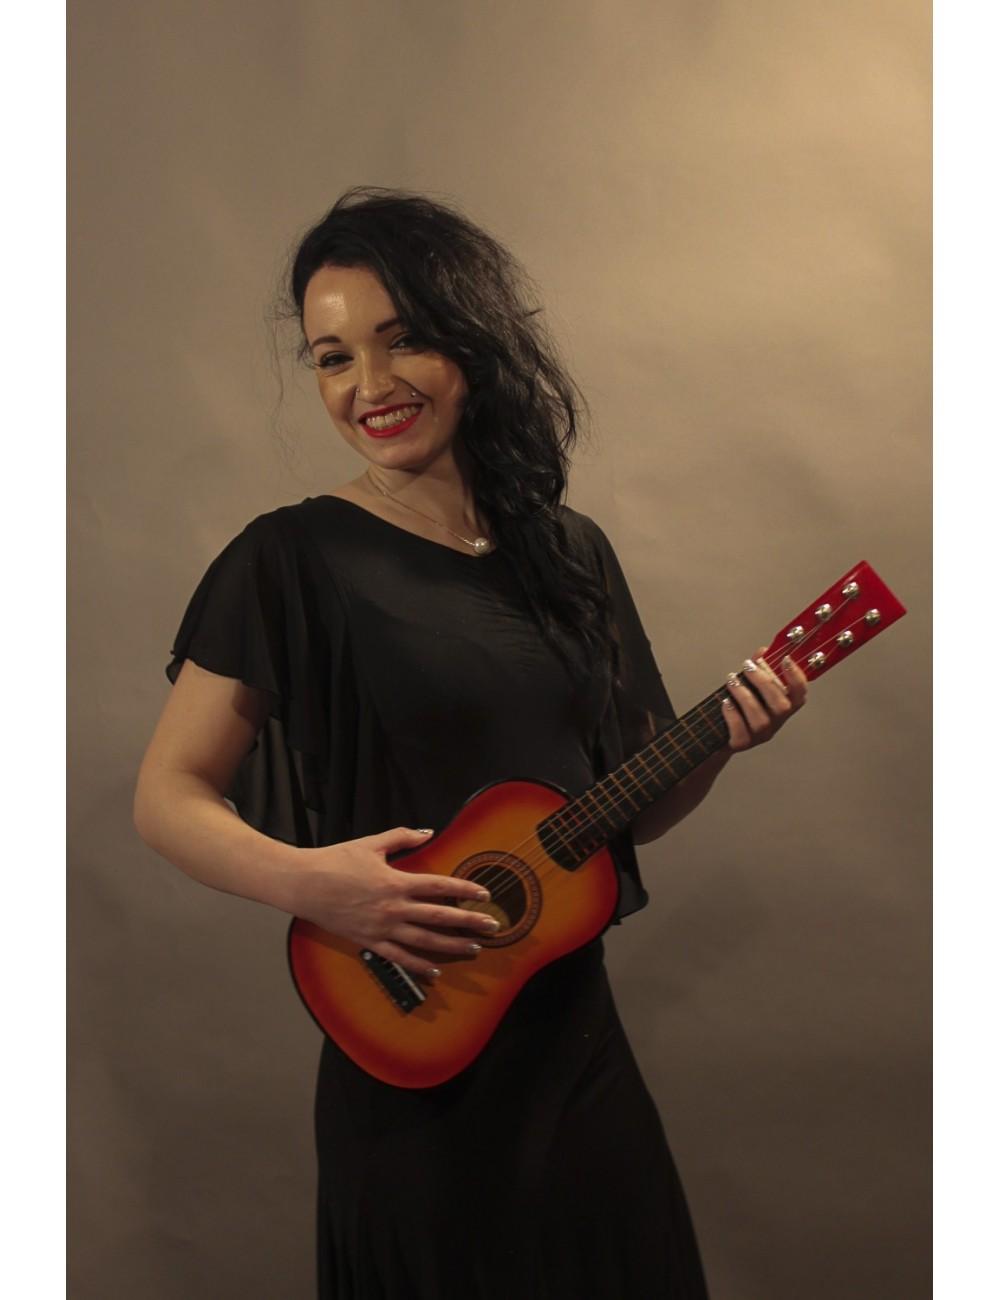 Guitare flamenco Jouet